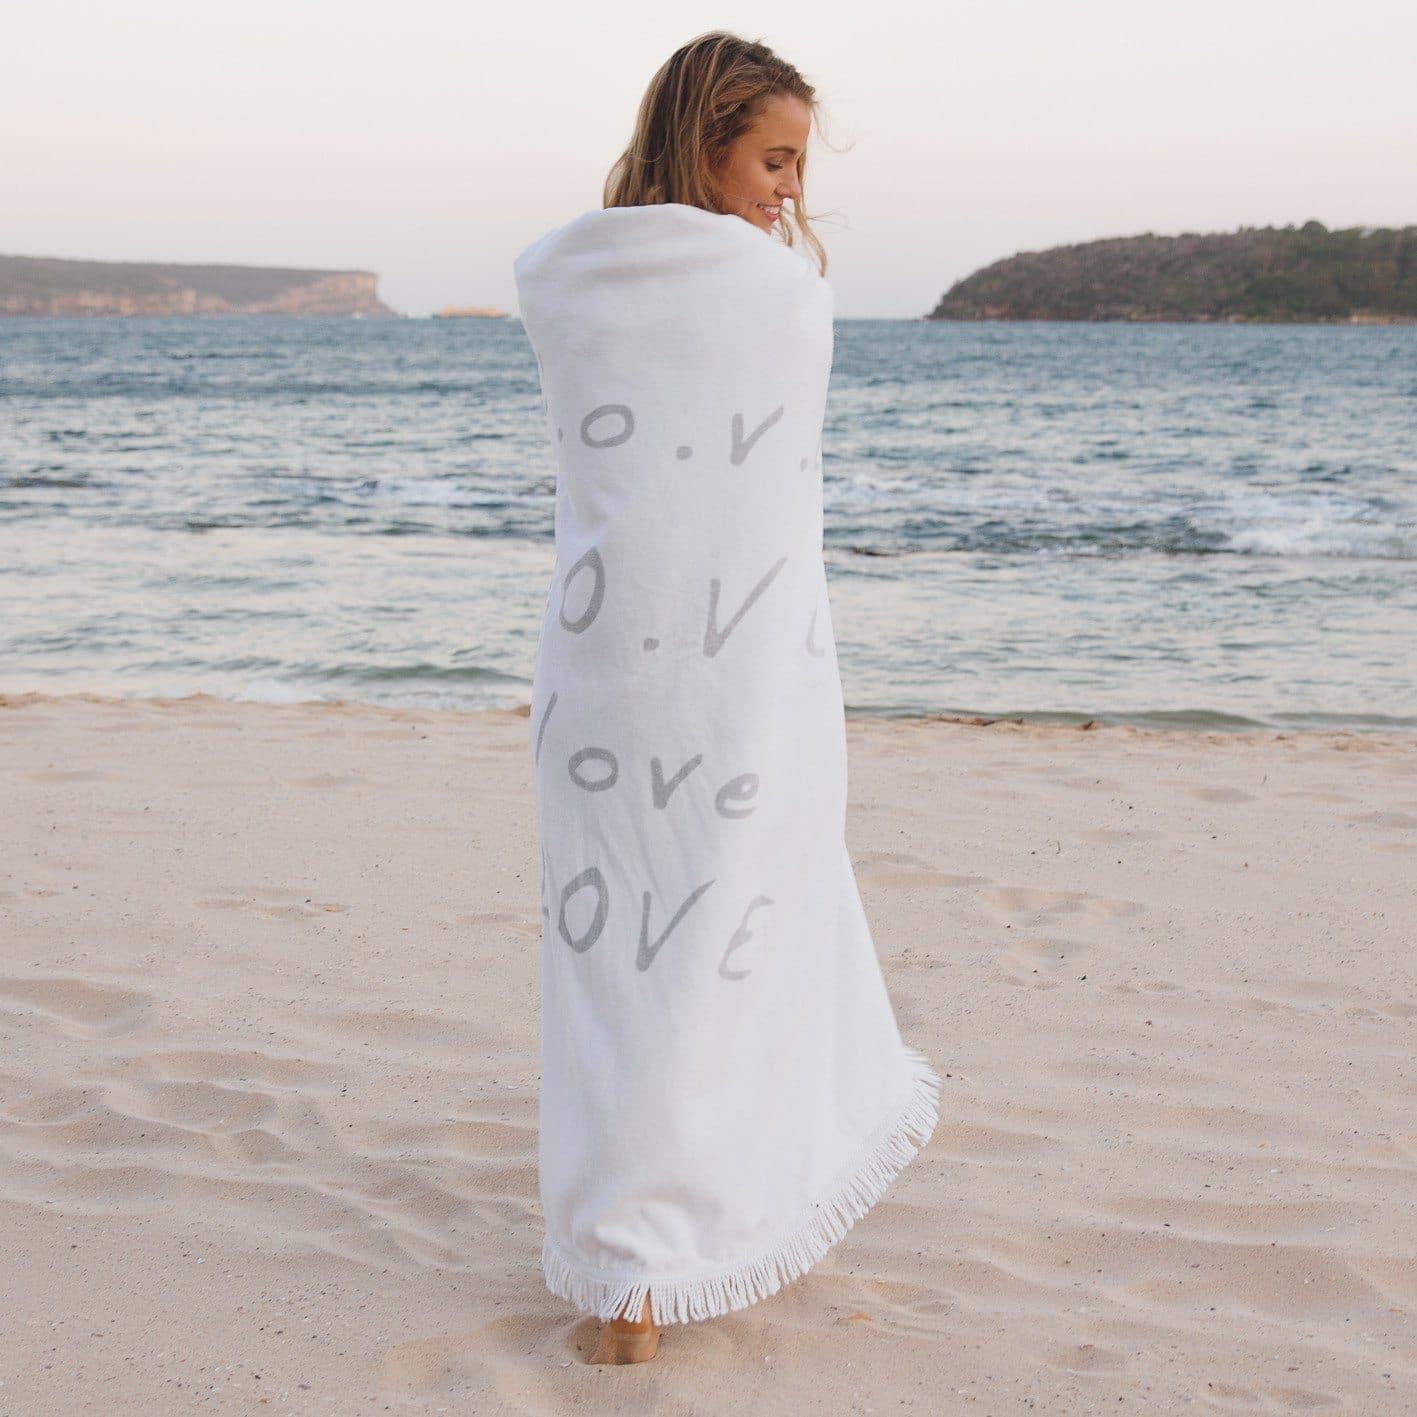 Round Beach Towel/Picnic Blanket - Love Always